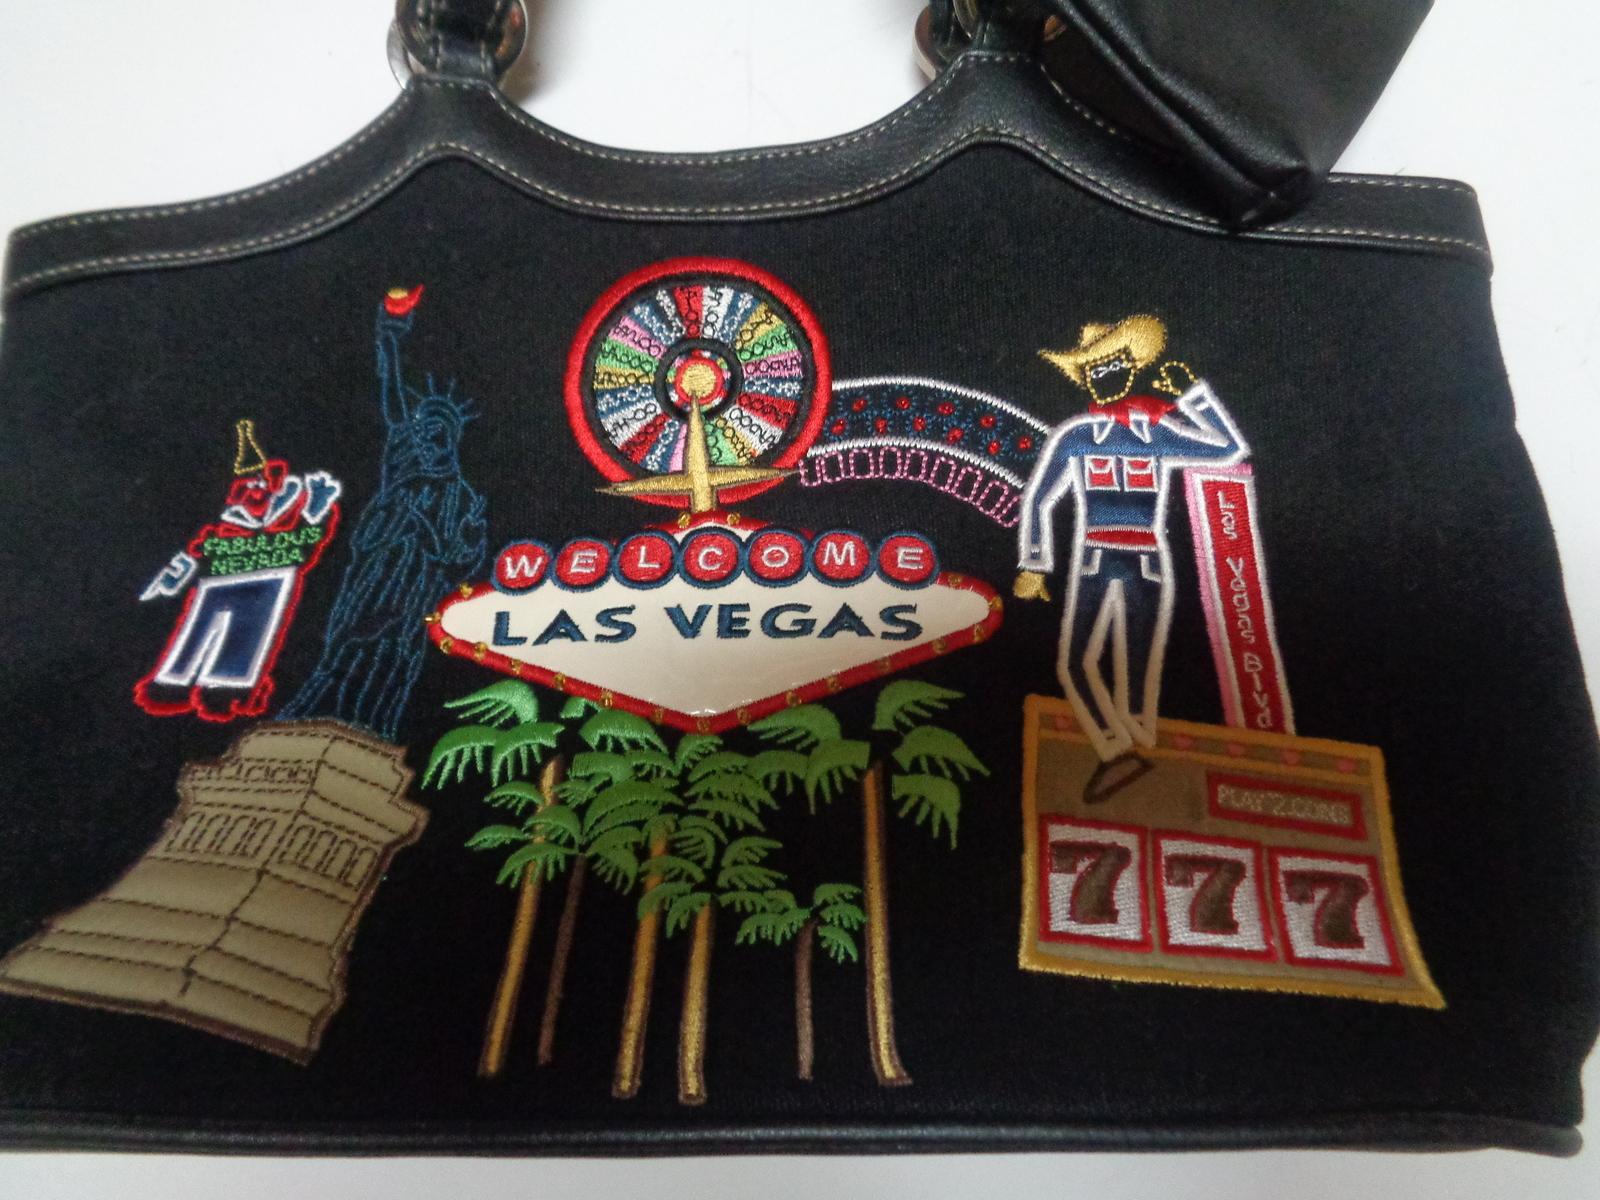 Las Vegas Nevada Casino Party Purse Black W/Las Vegas Images